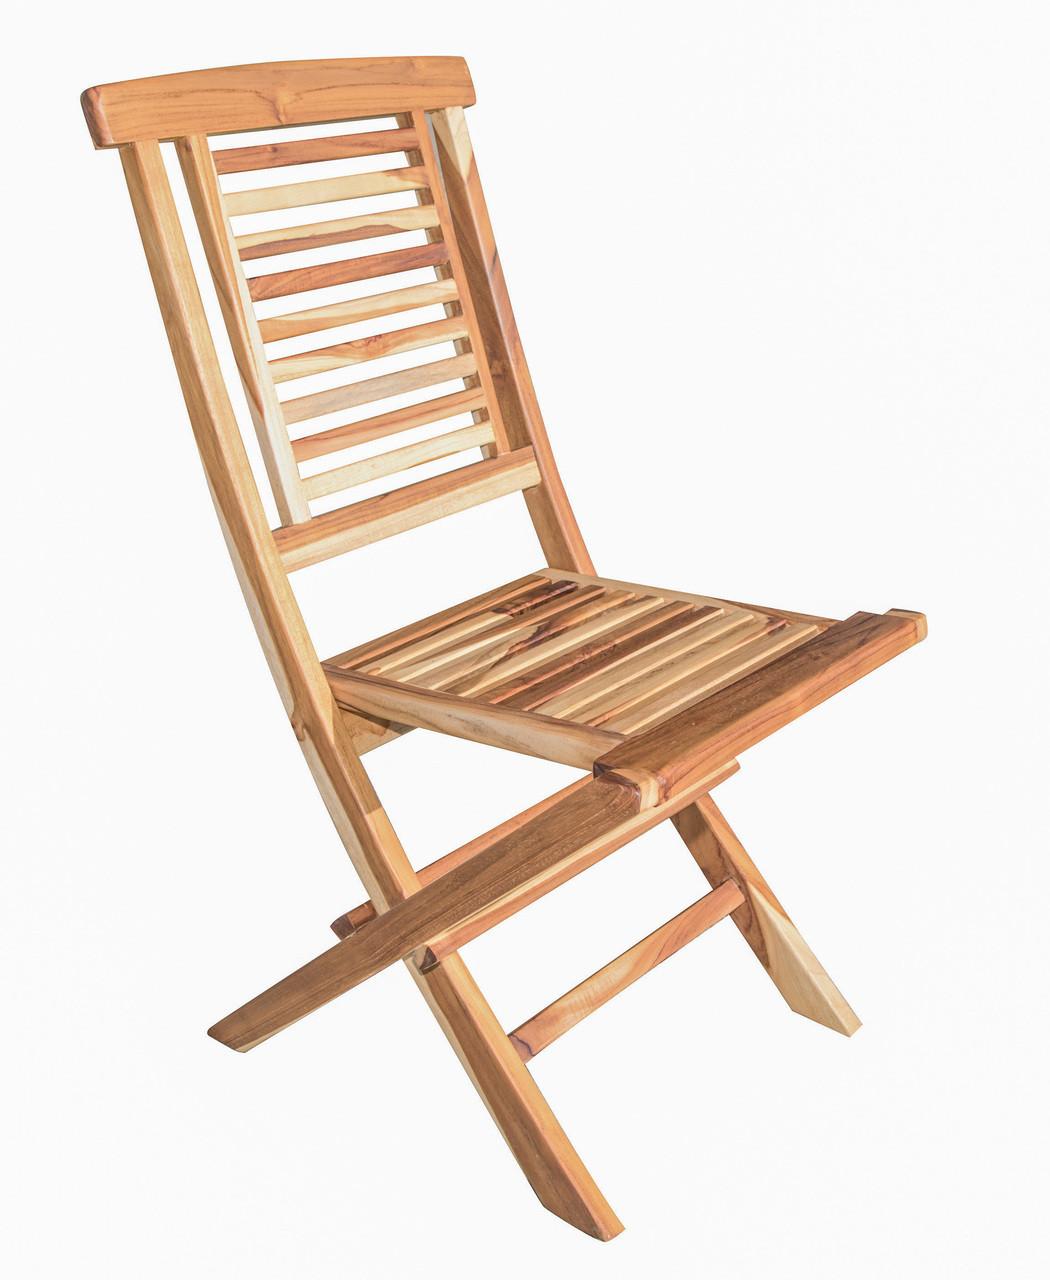 teak folding chair bean bag baby recall ecodecors indoor outdoor dining image 1